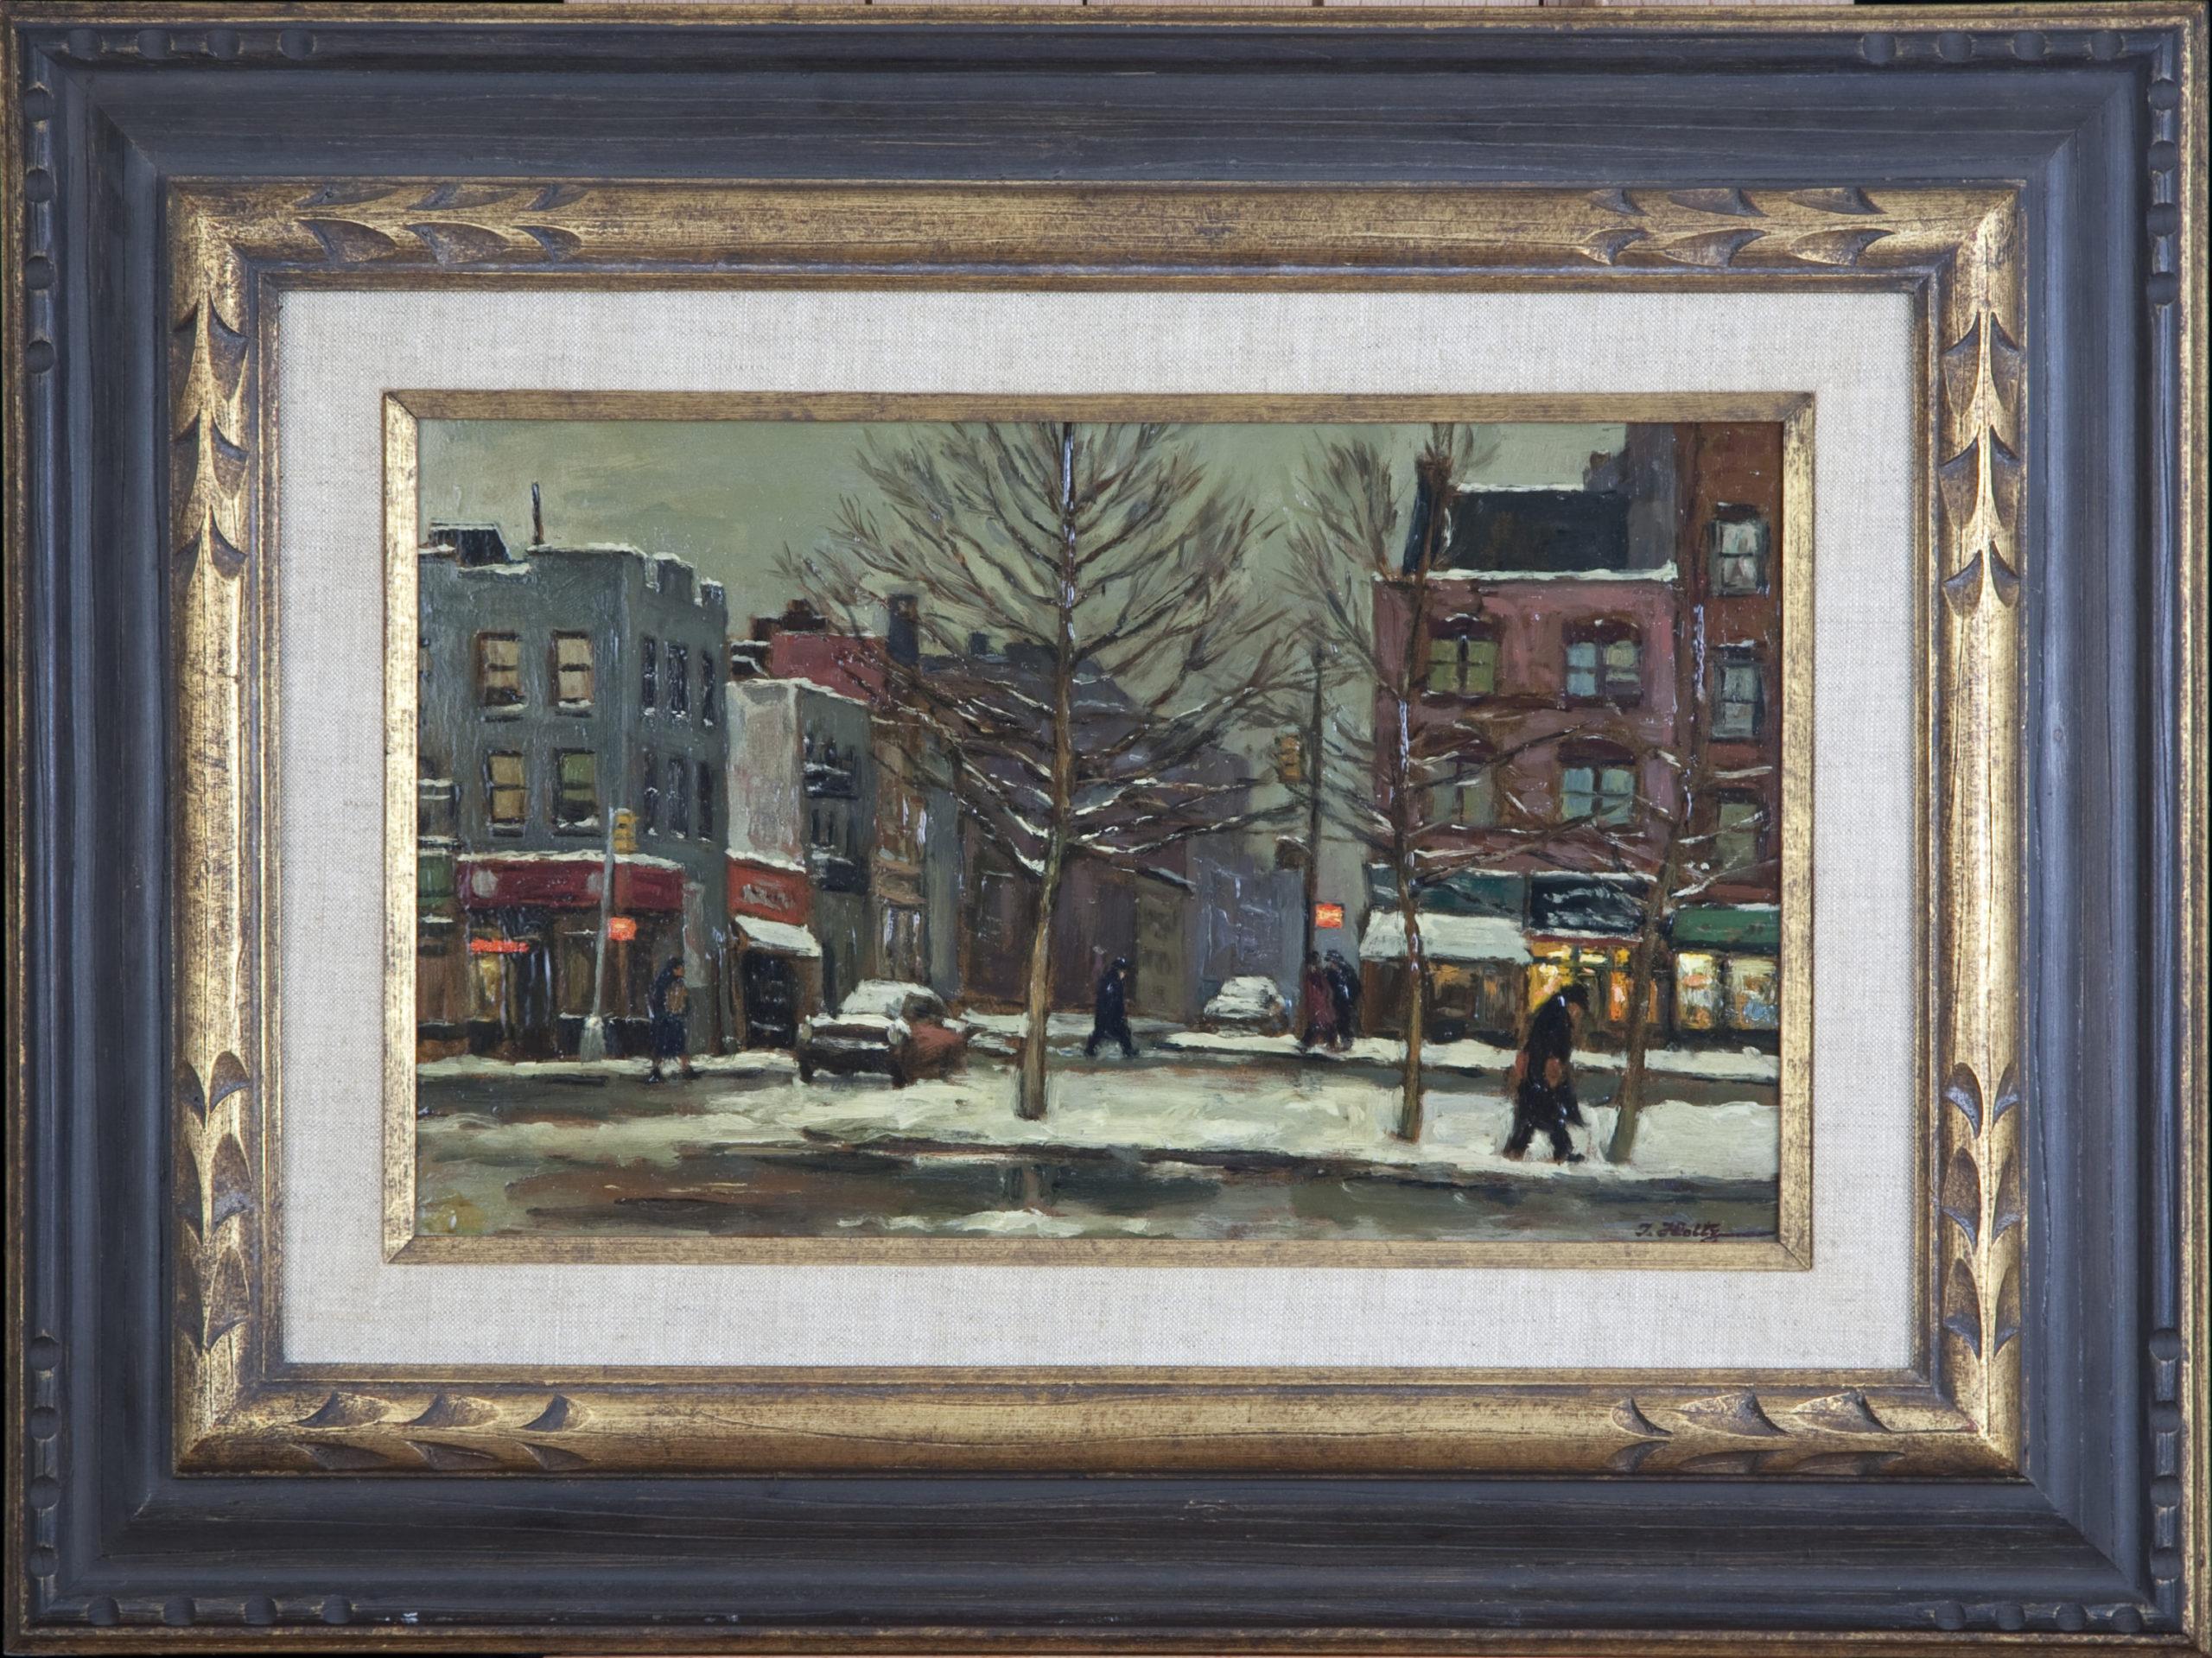 233 Winter NY 1965 - Oil on Masonite - 15 x 9 - Frame: 23.5 x 17.5 x 1.5